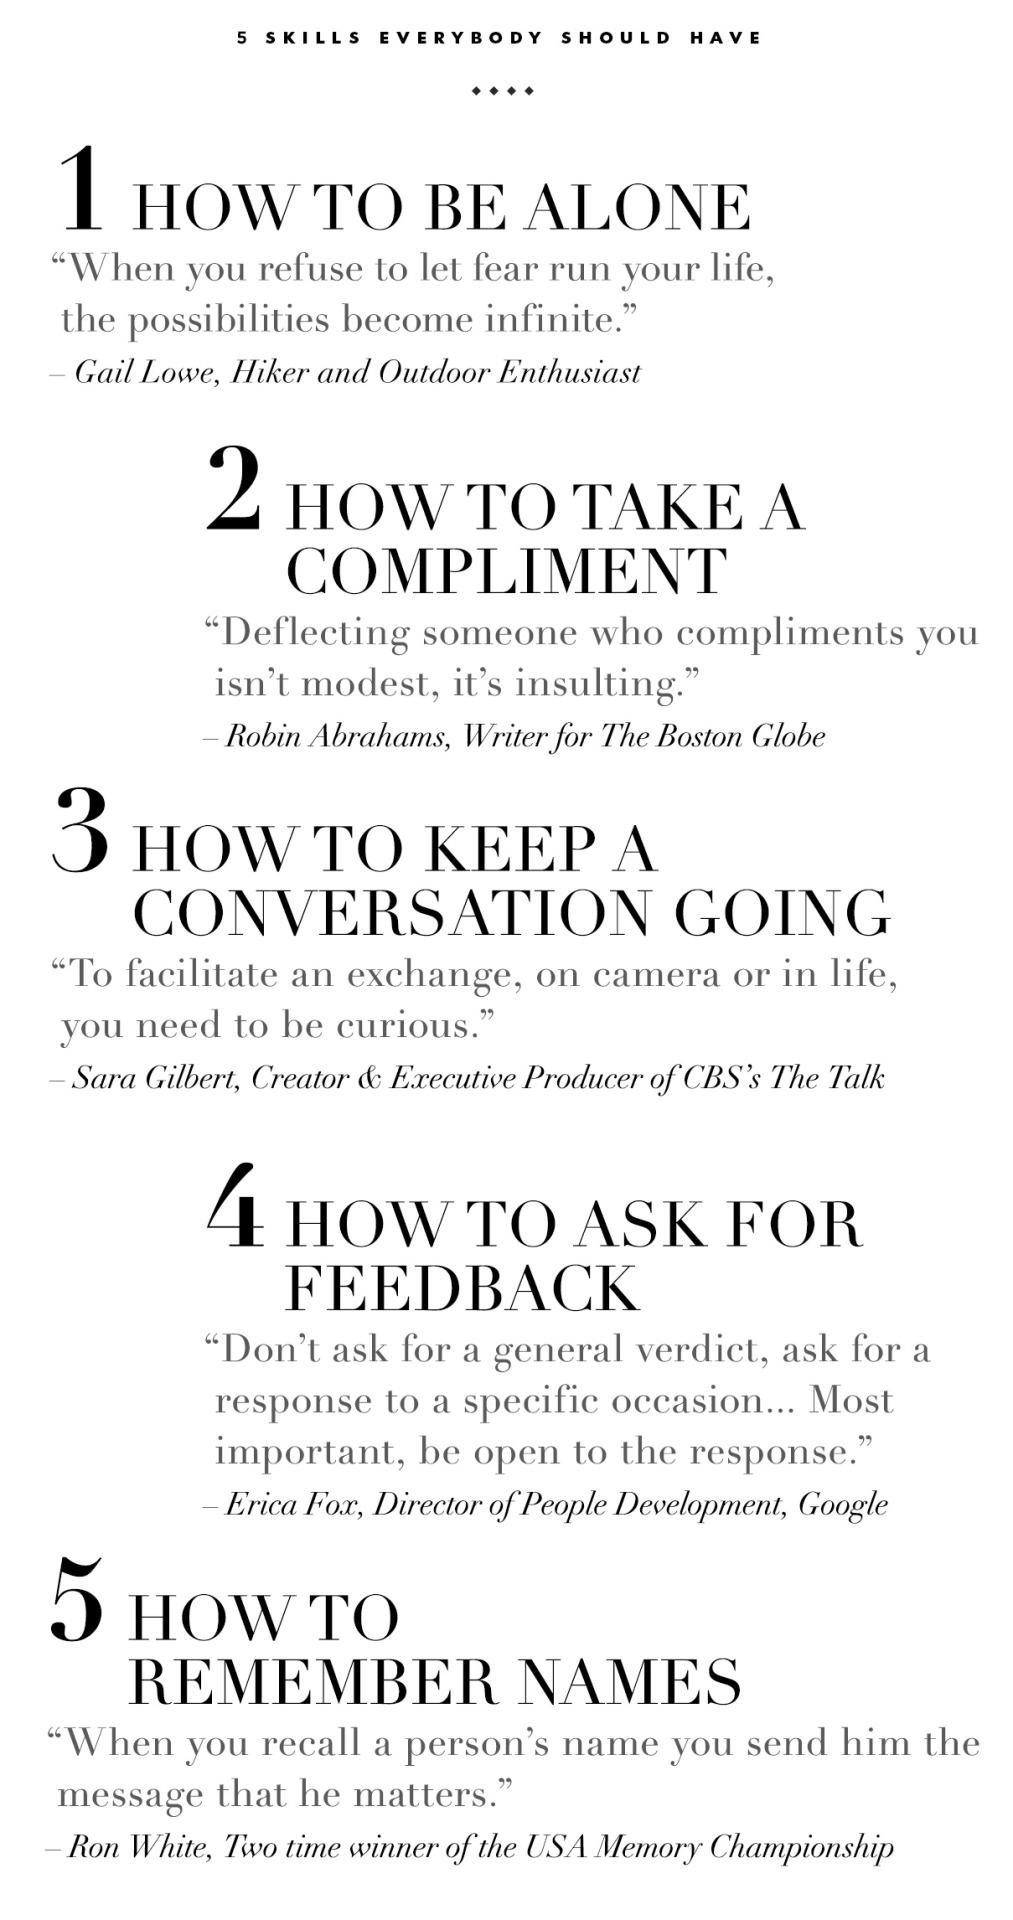 5 skills everybody should have.